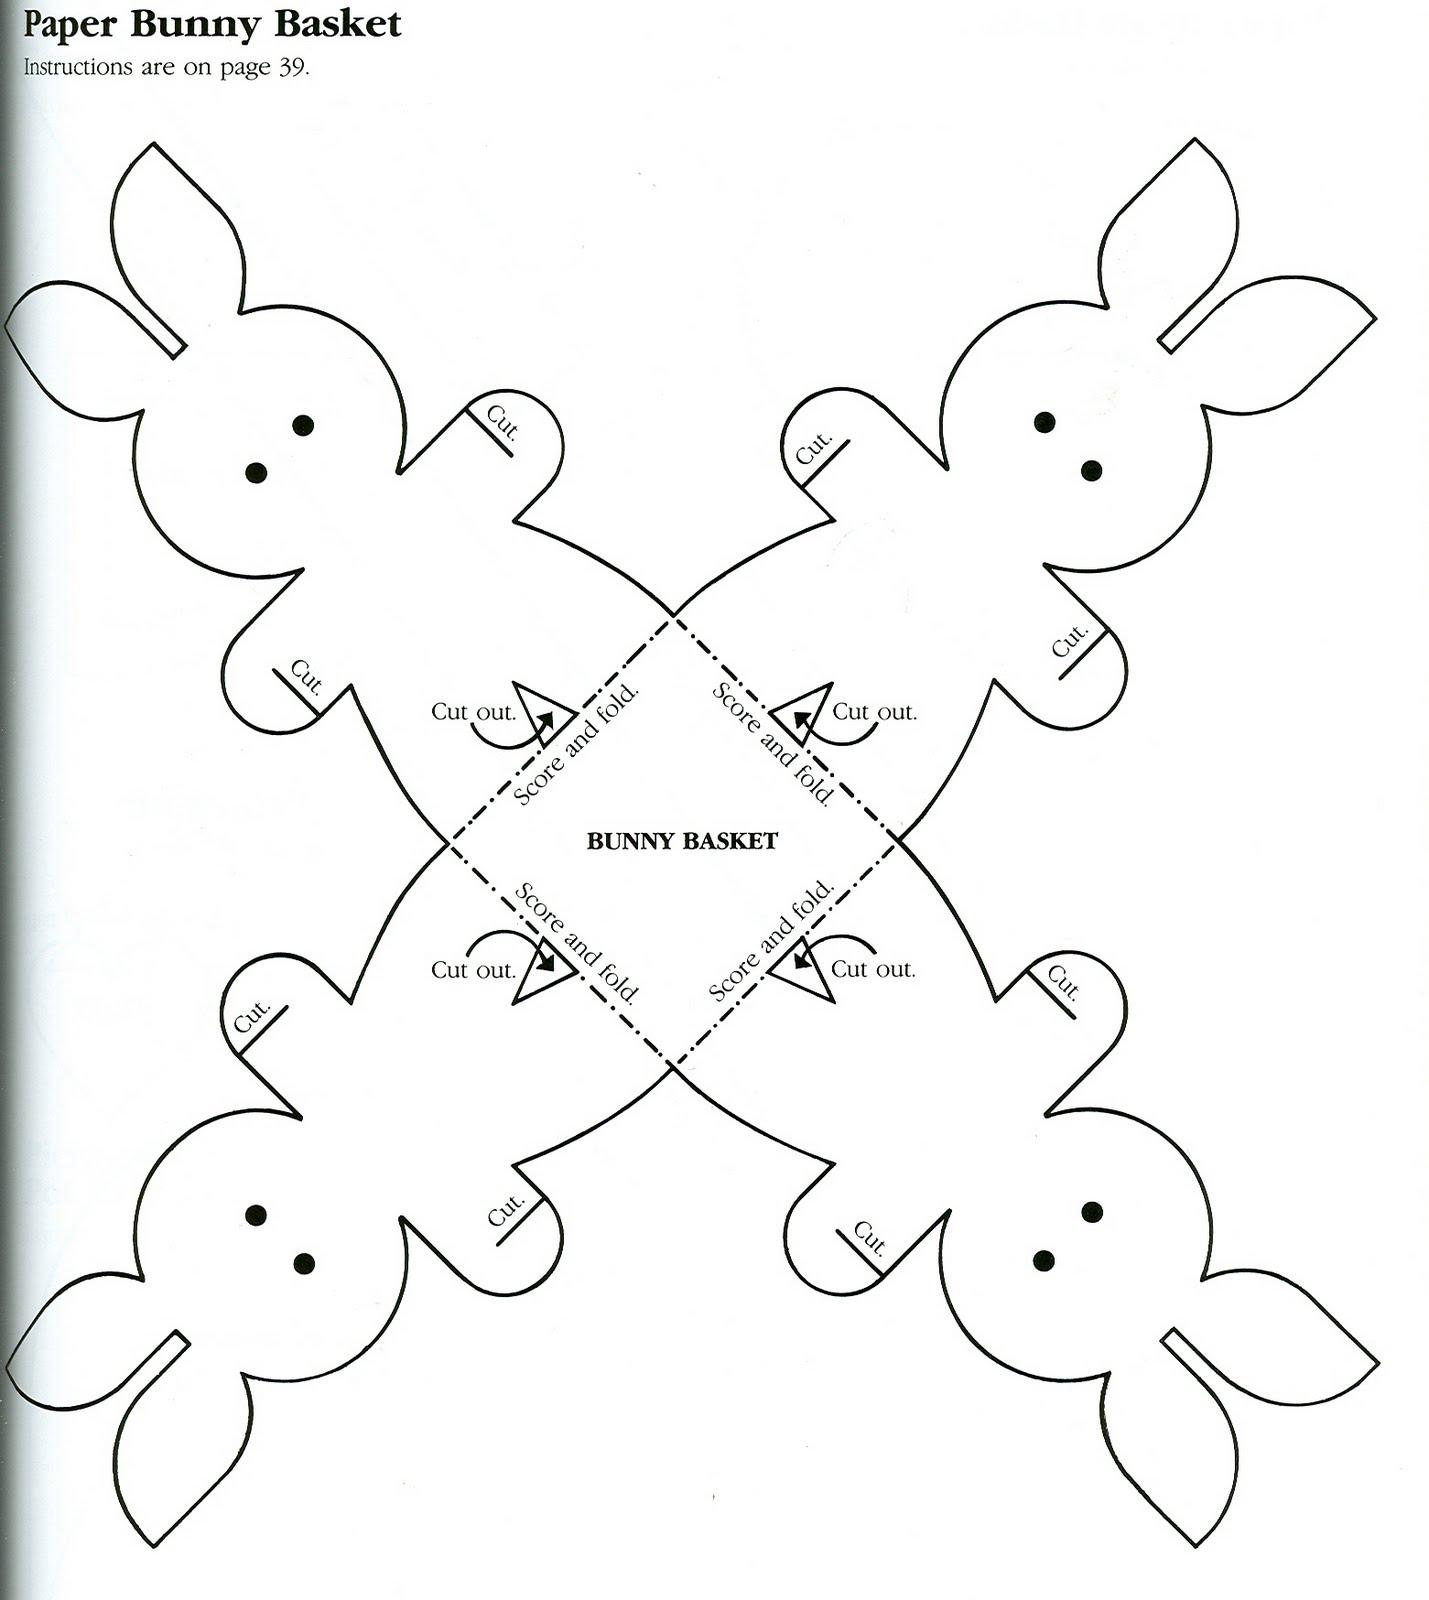 Free Printable Easter Basket Templates – Hd Easter Images - Free Printable Easter Egg Basket Templates